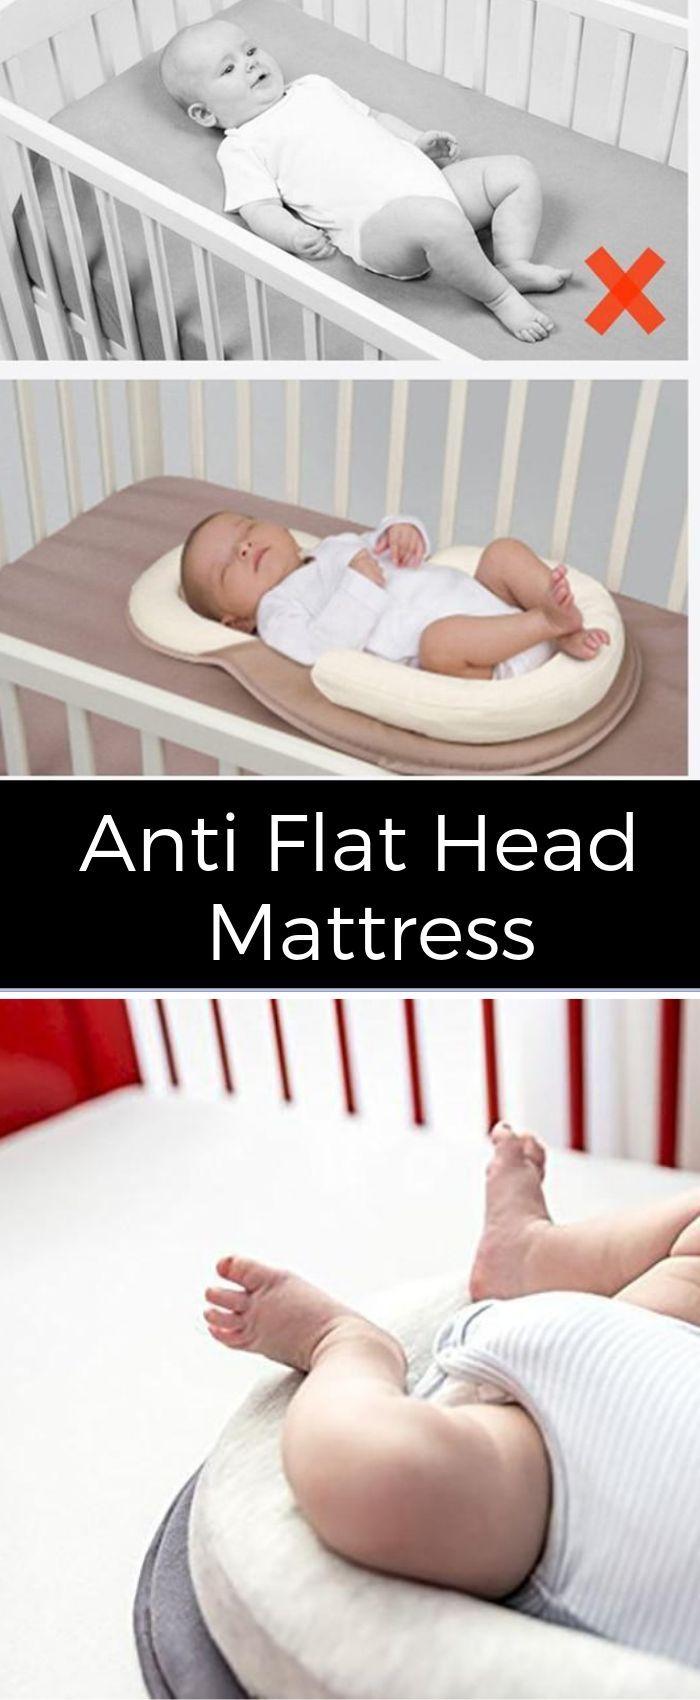 Anti Flat Head Baby Mattress Baby Mattress New Baby Products Baby Health